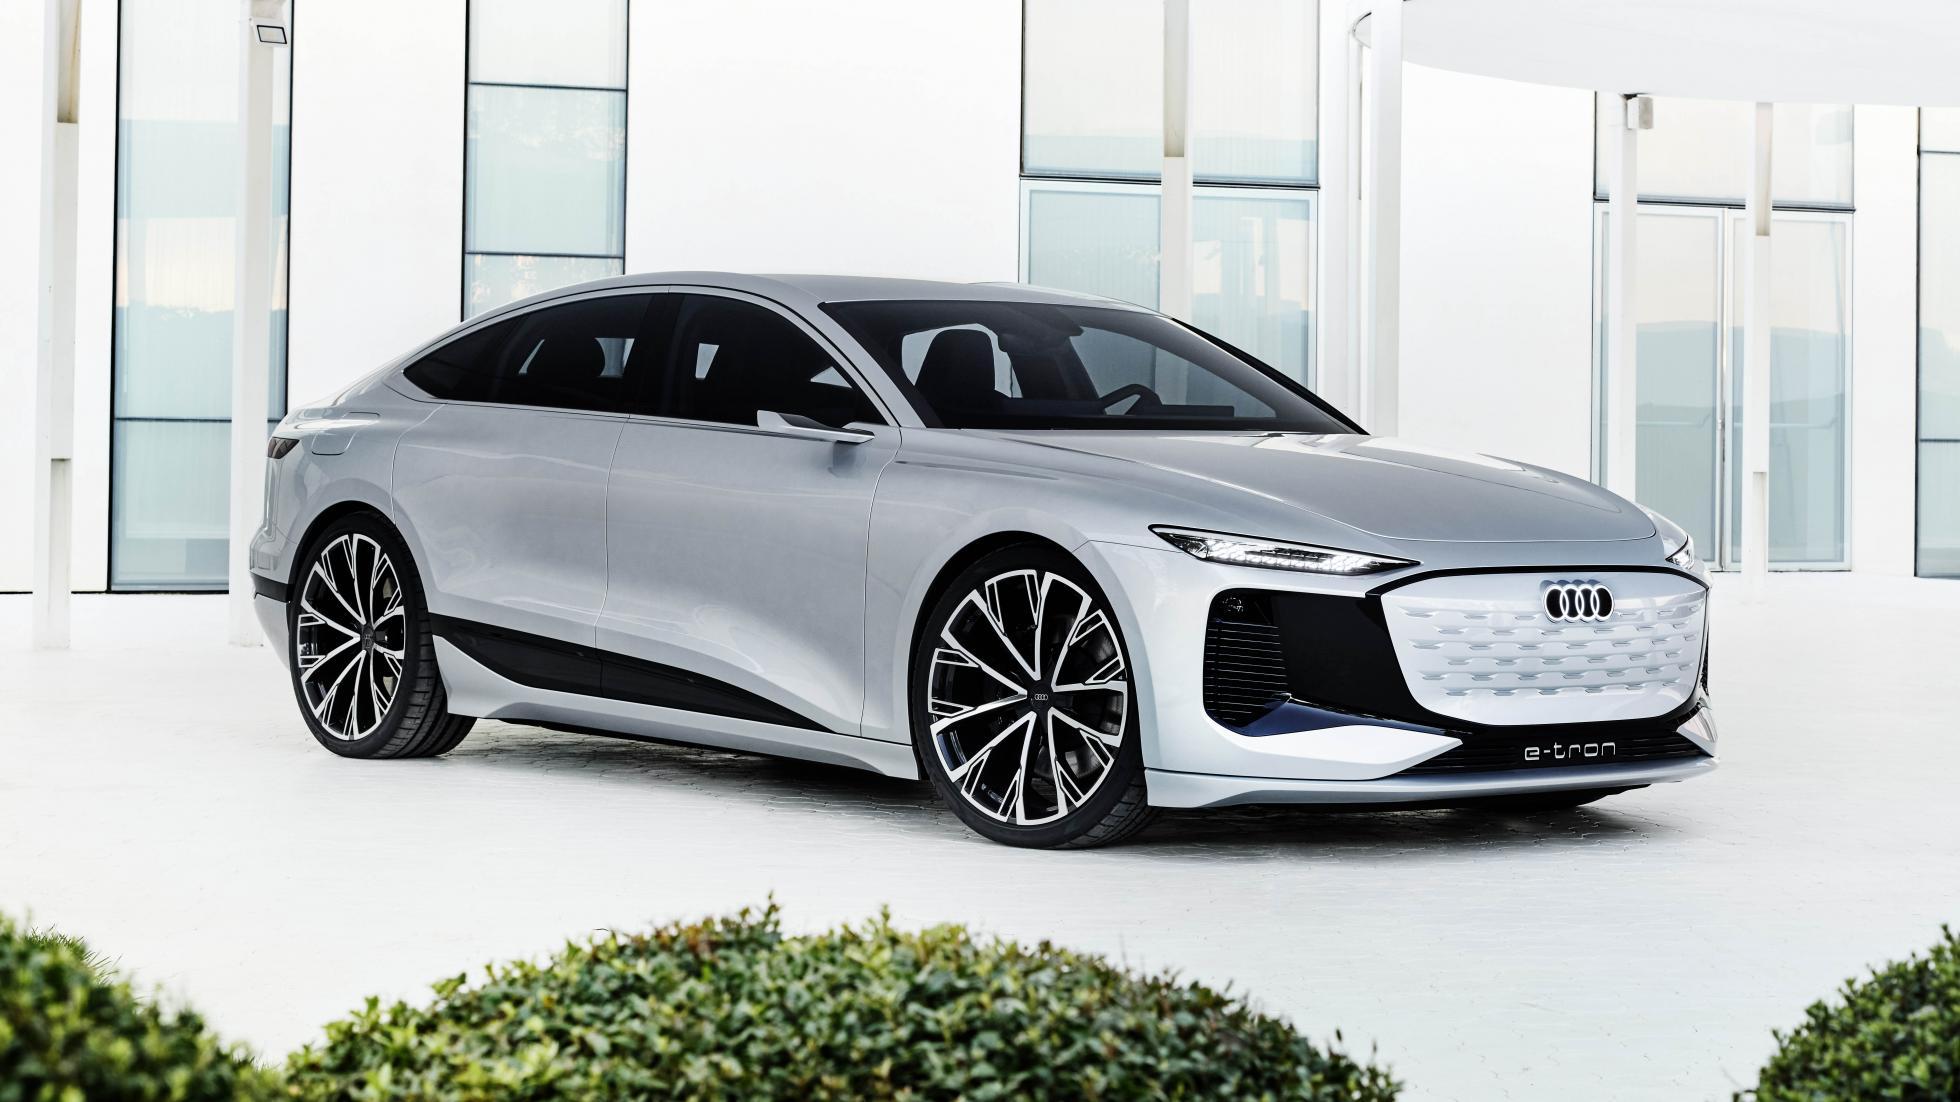 The Audi A6 e-tron concept Showcase